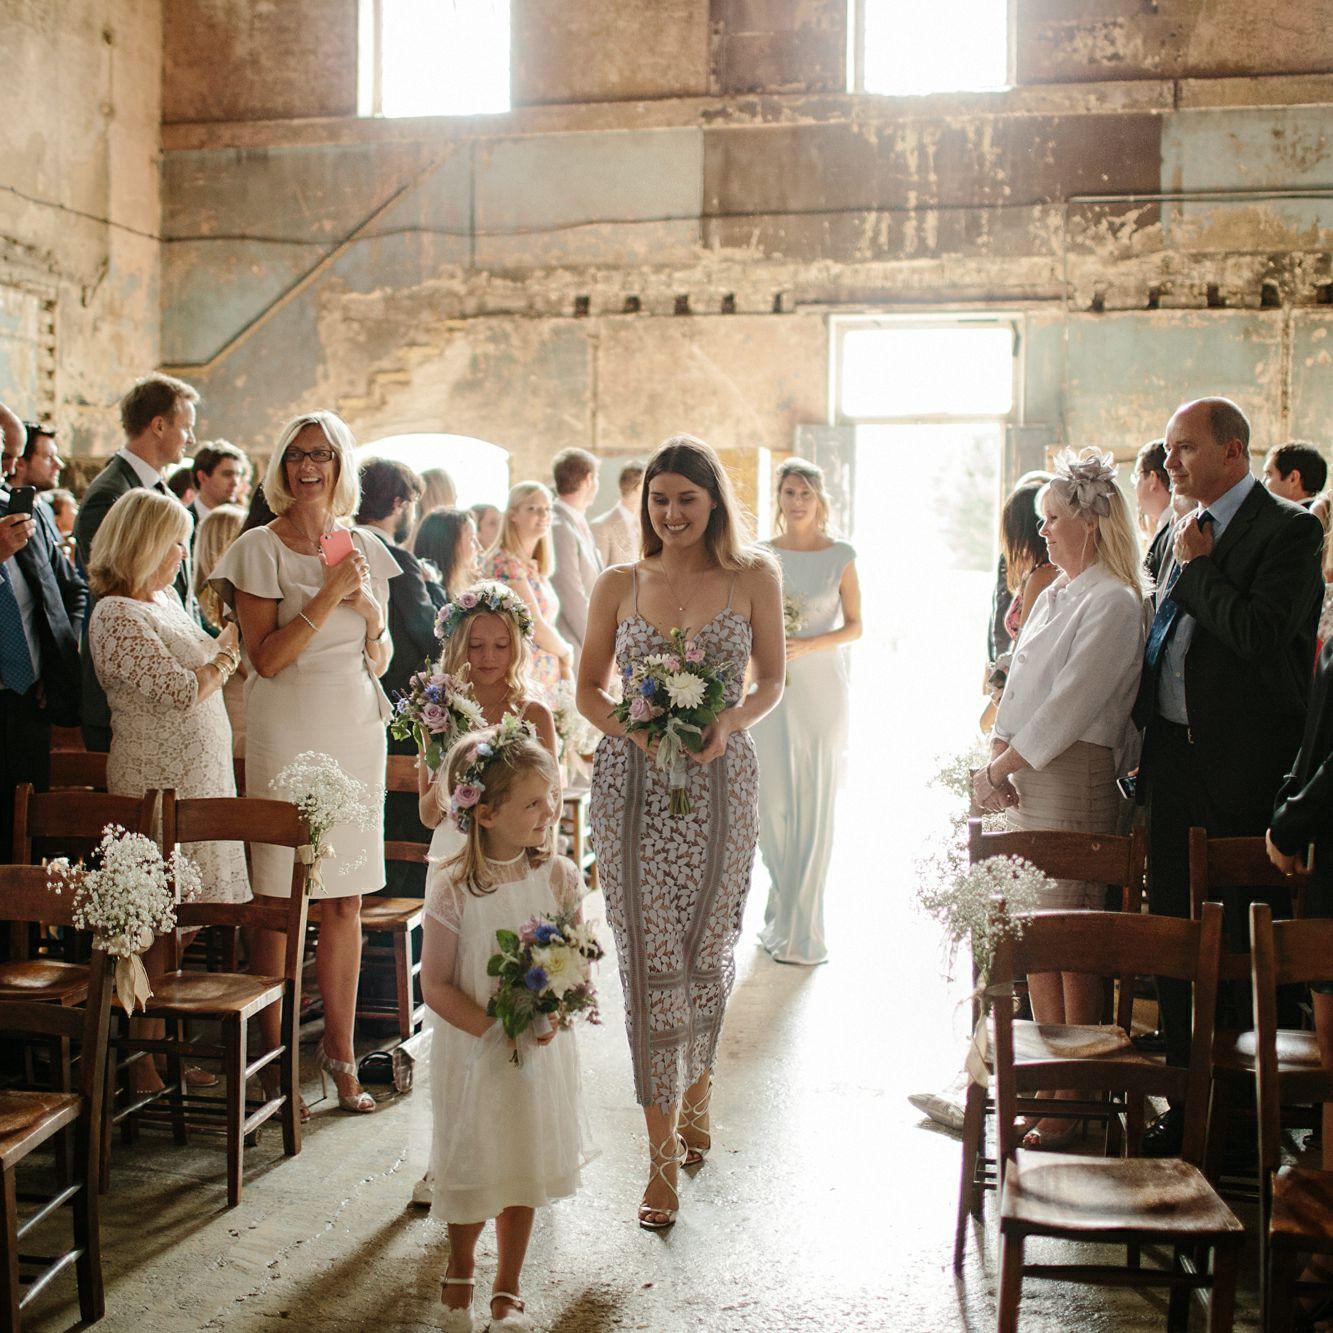 135 instrumental wedding songs